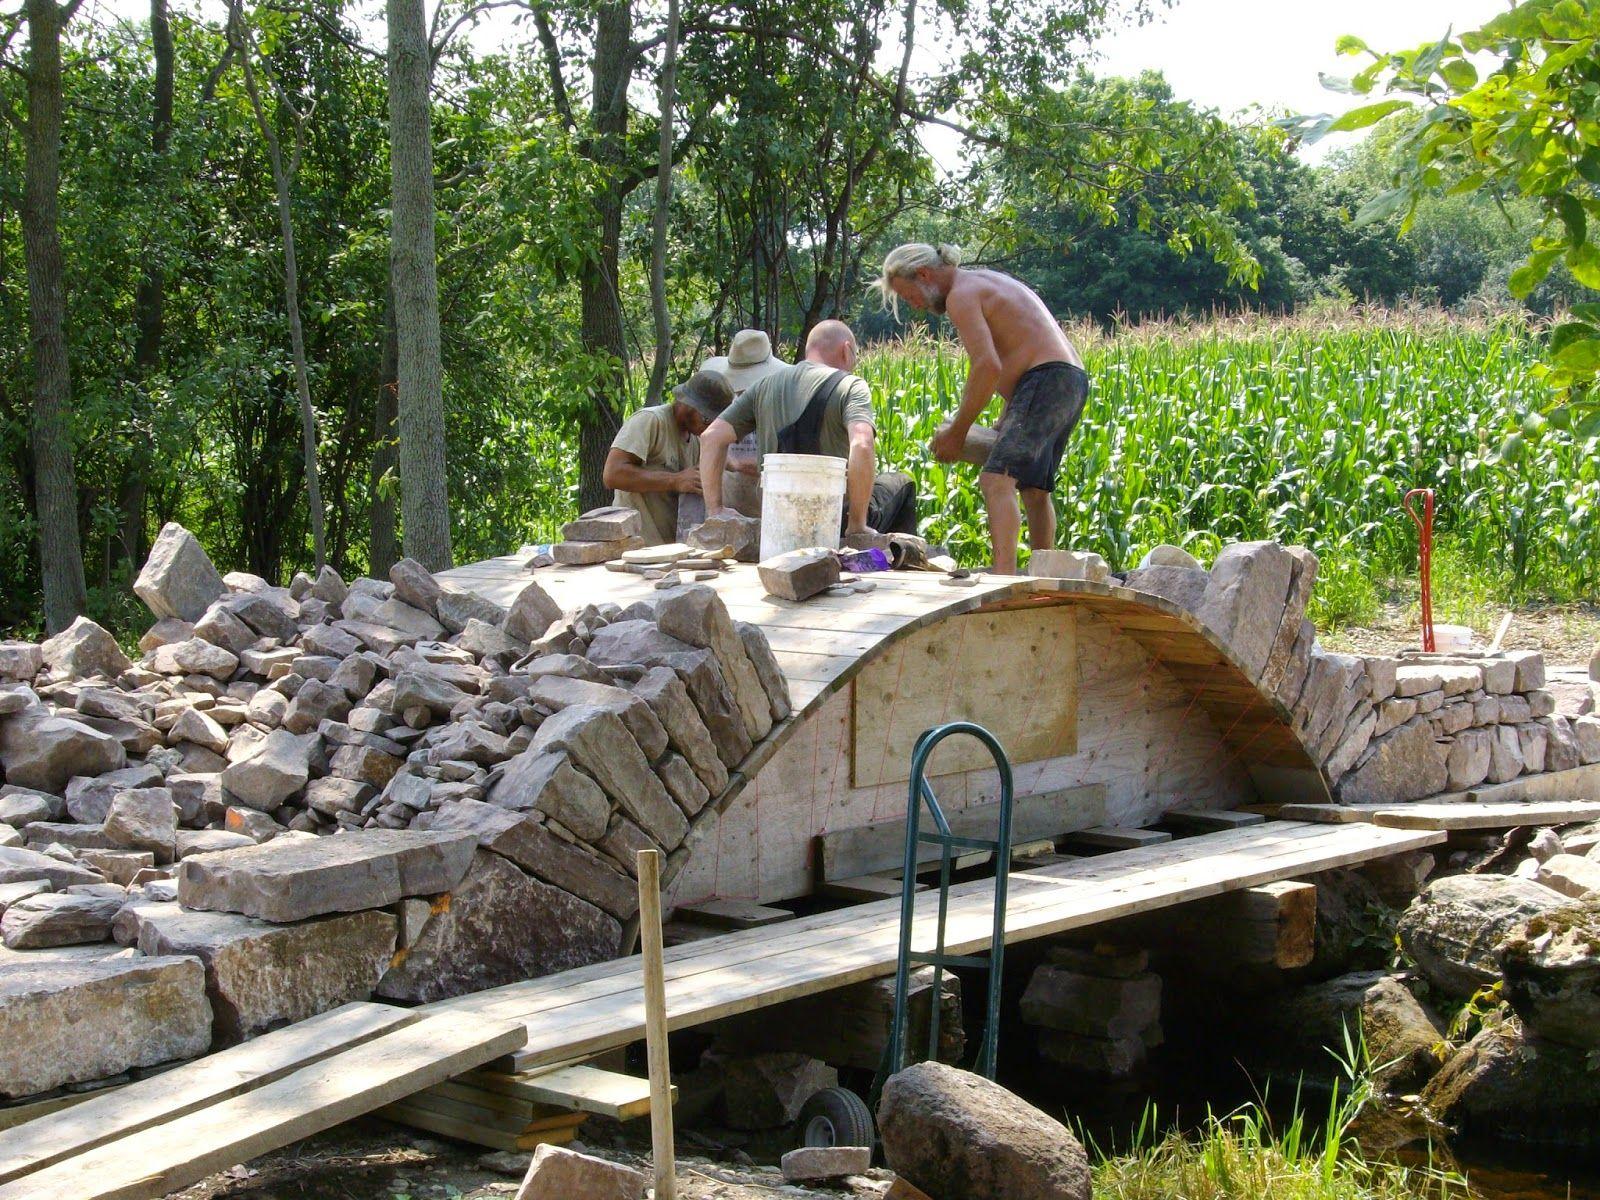 how to build stone bridge over creek google search stone stone masonry stone houses. Black Bedroom Furniture Sets. Home Design Ideas